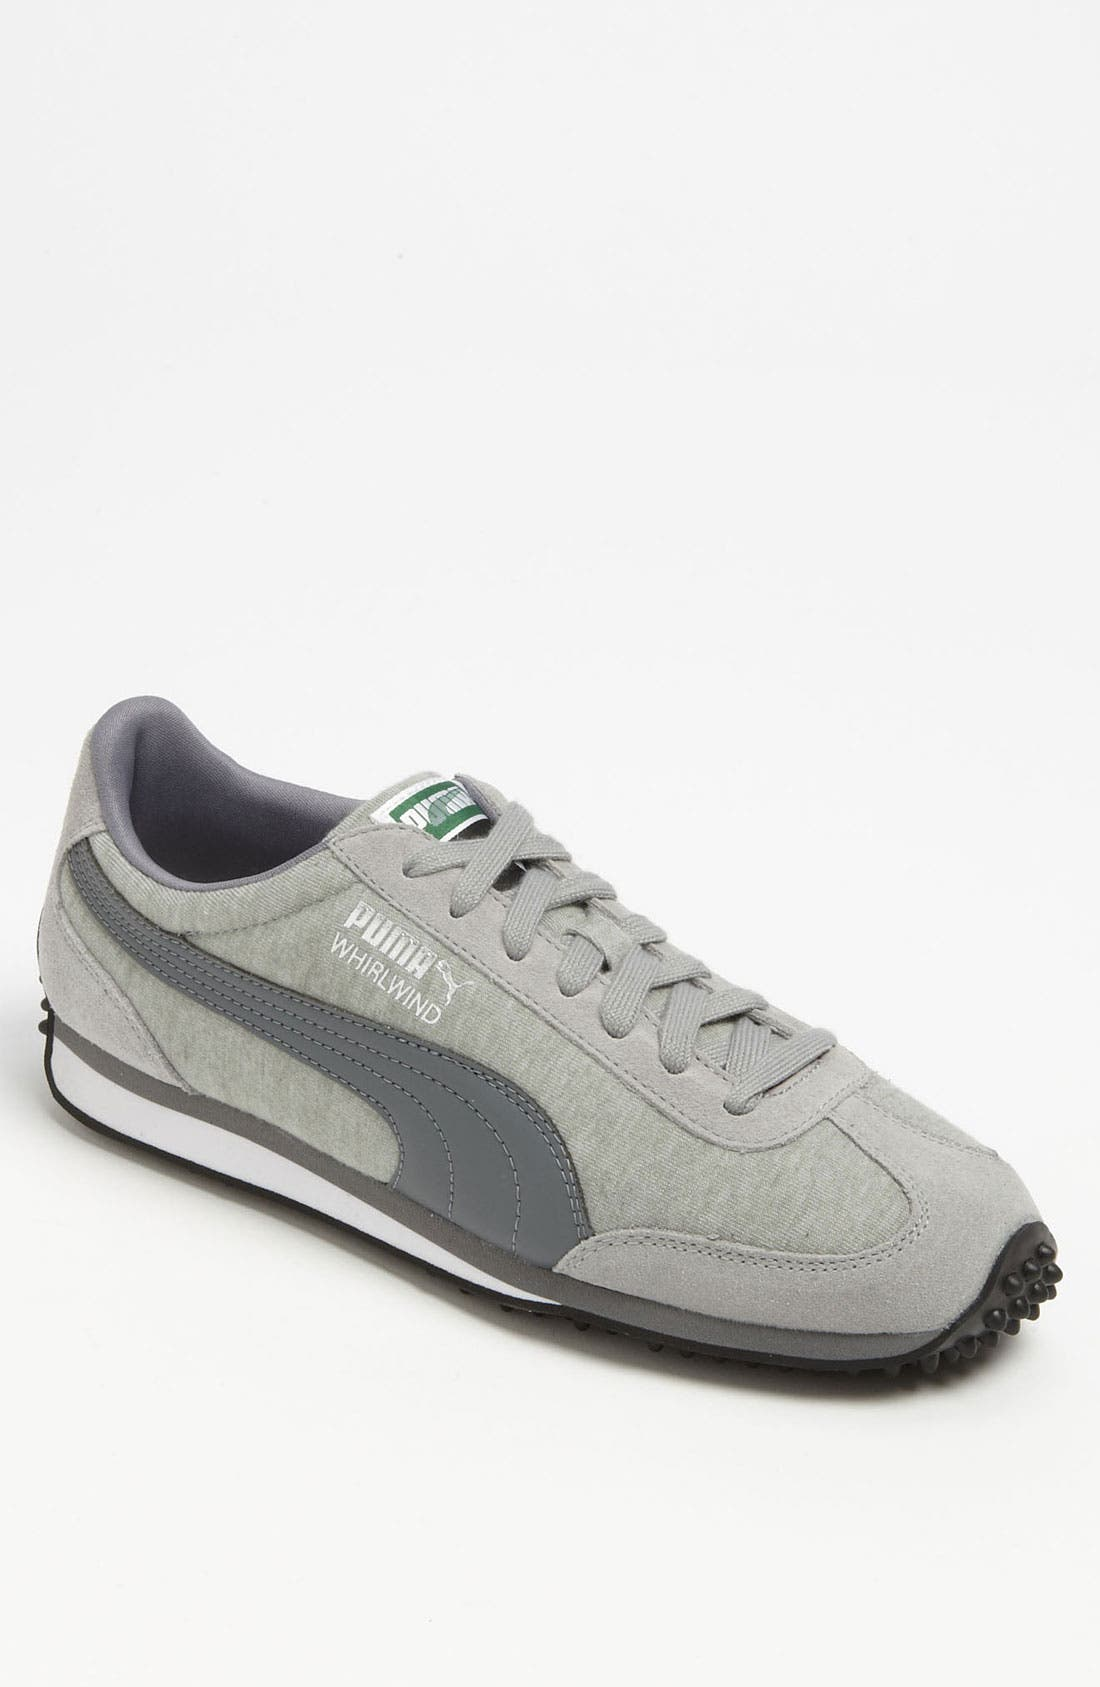 Main Image - PUMA 'Whirlwind' Sneaker (Men)